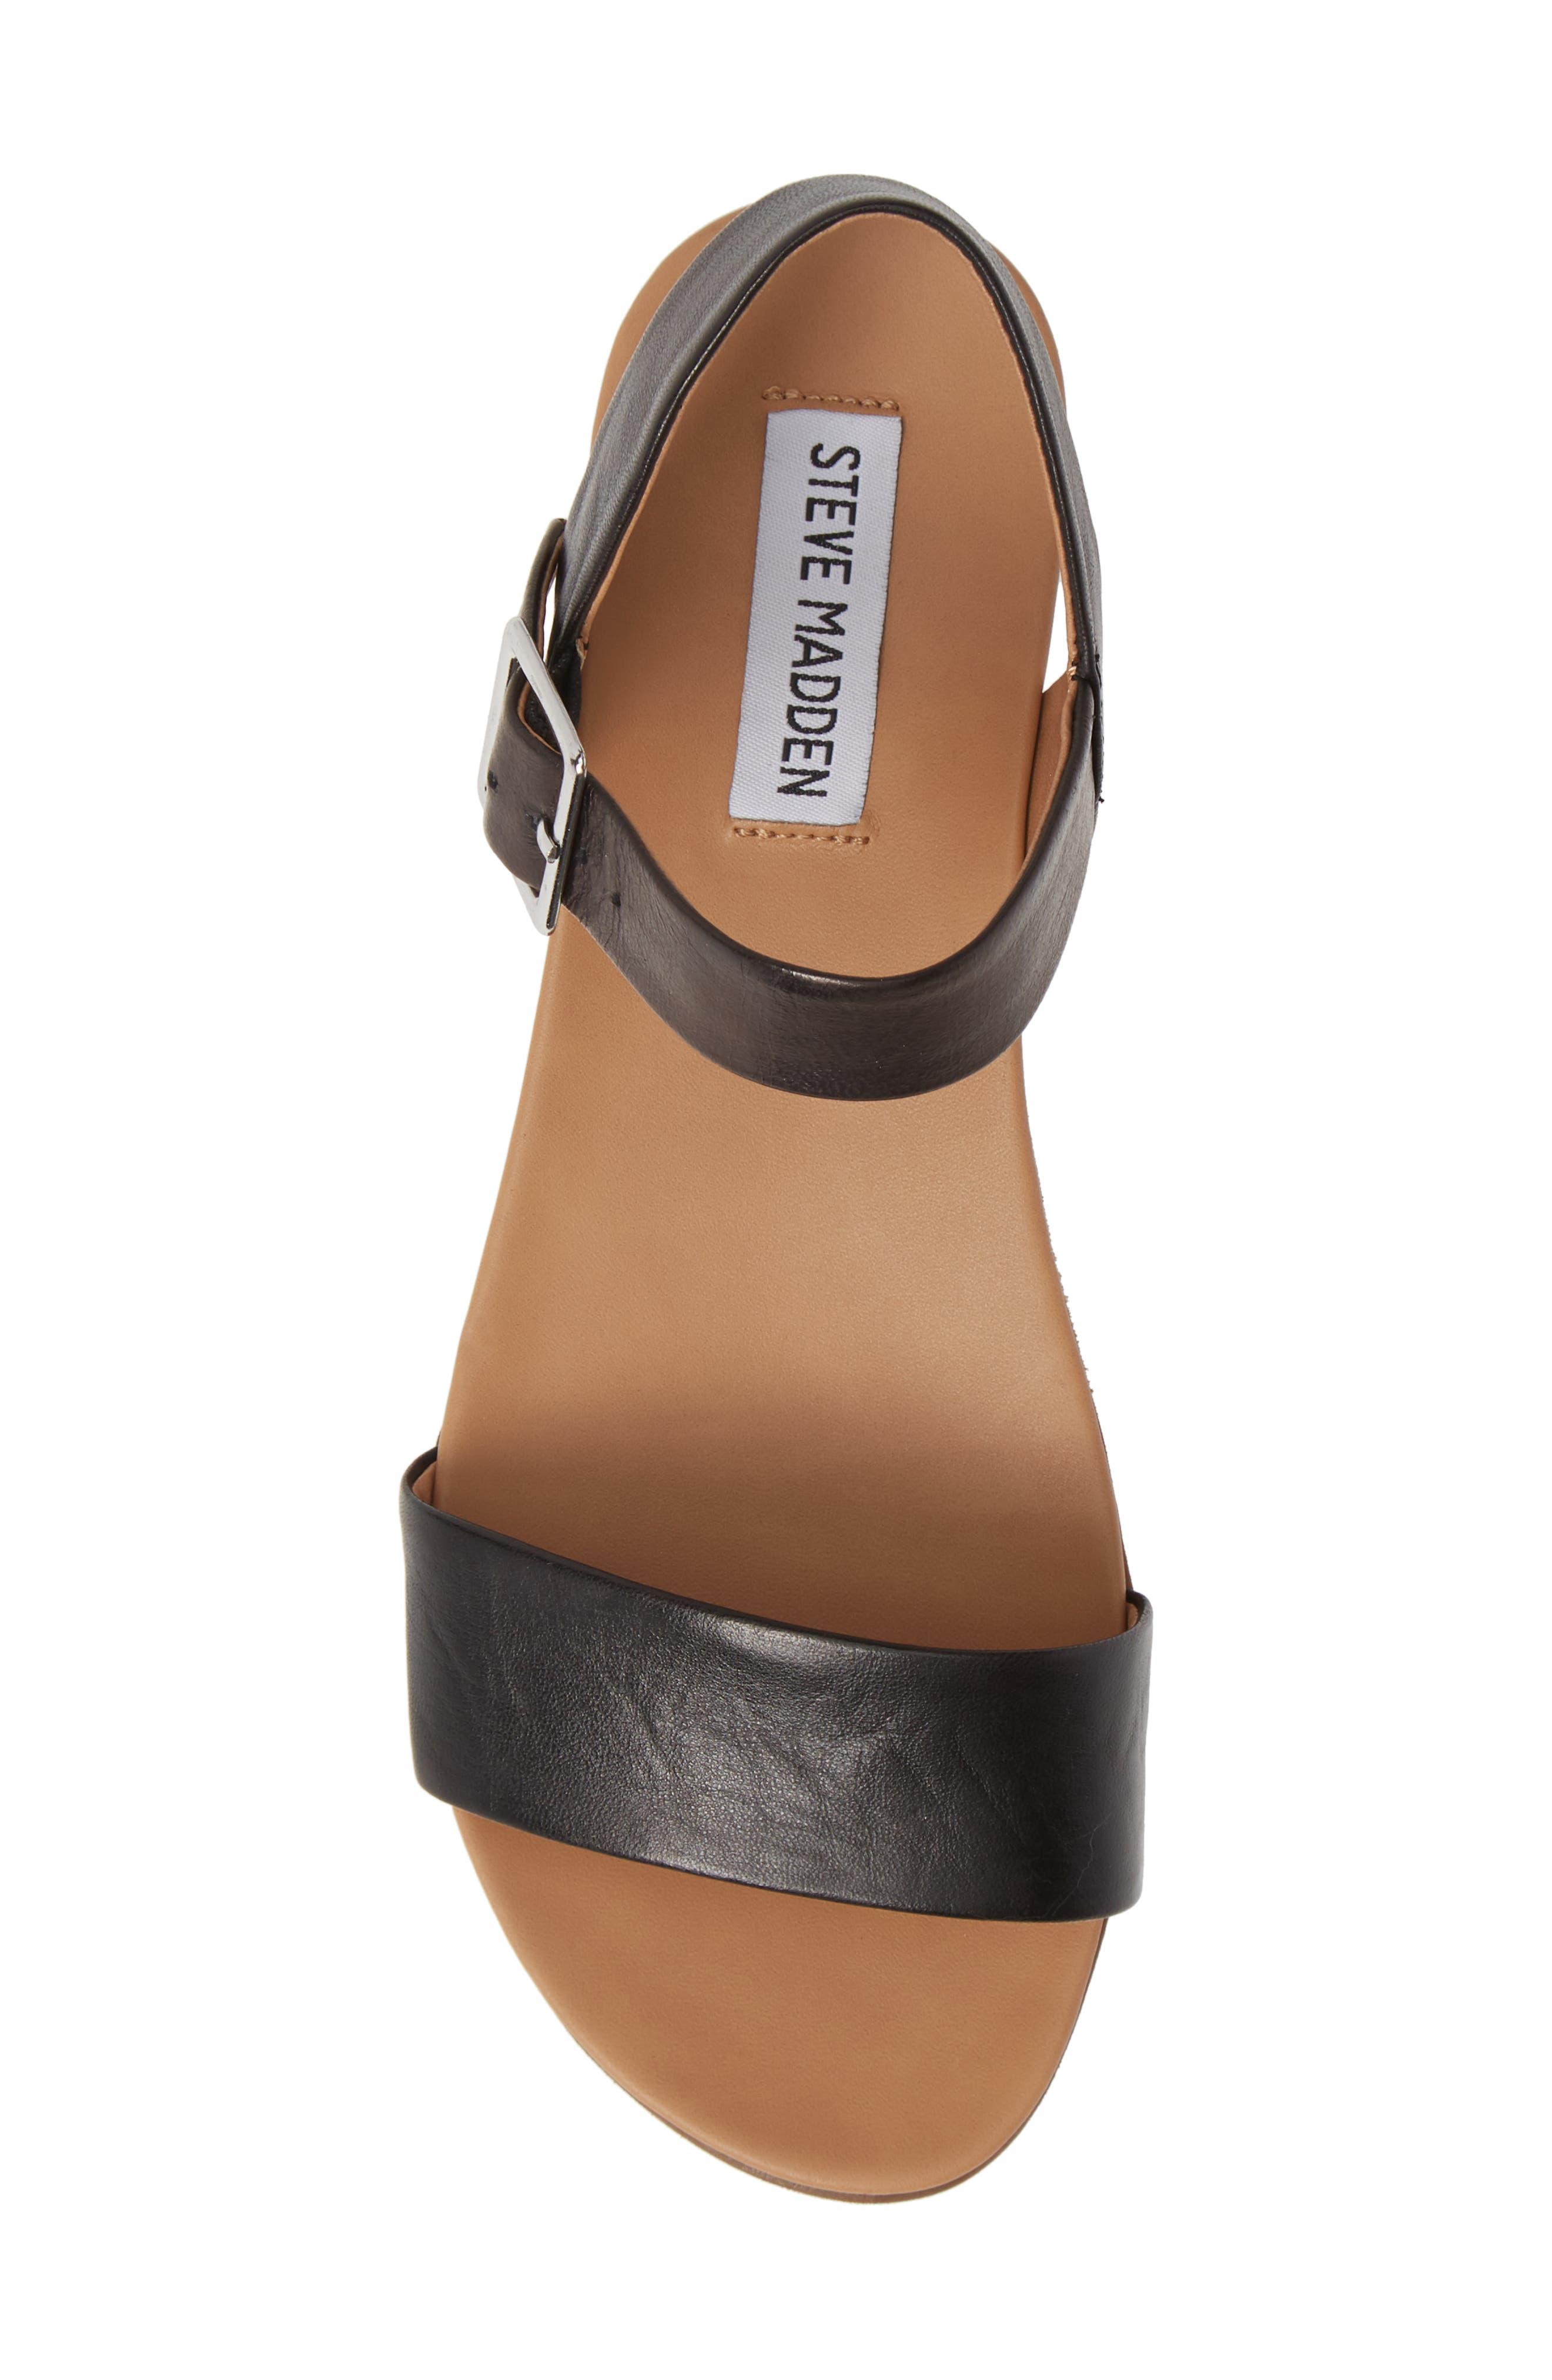 STEVE MADDEN, Aida Platform Sandal, Alternate thumbnail 5, color, BLACK LEATHER